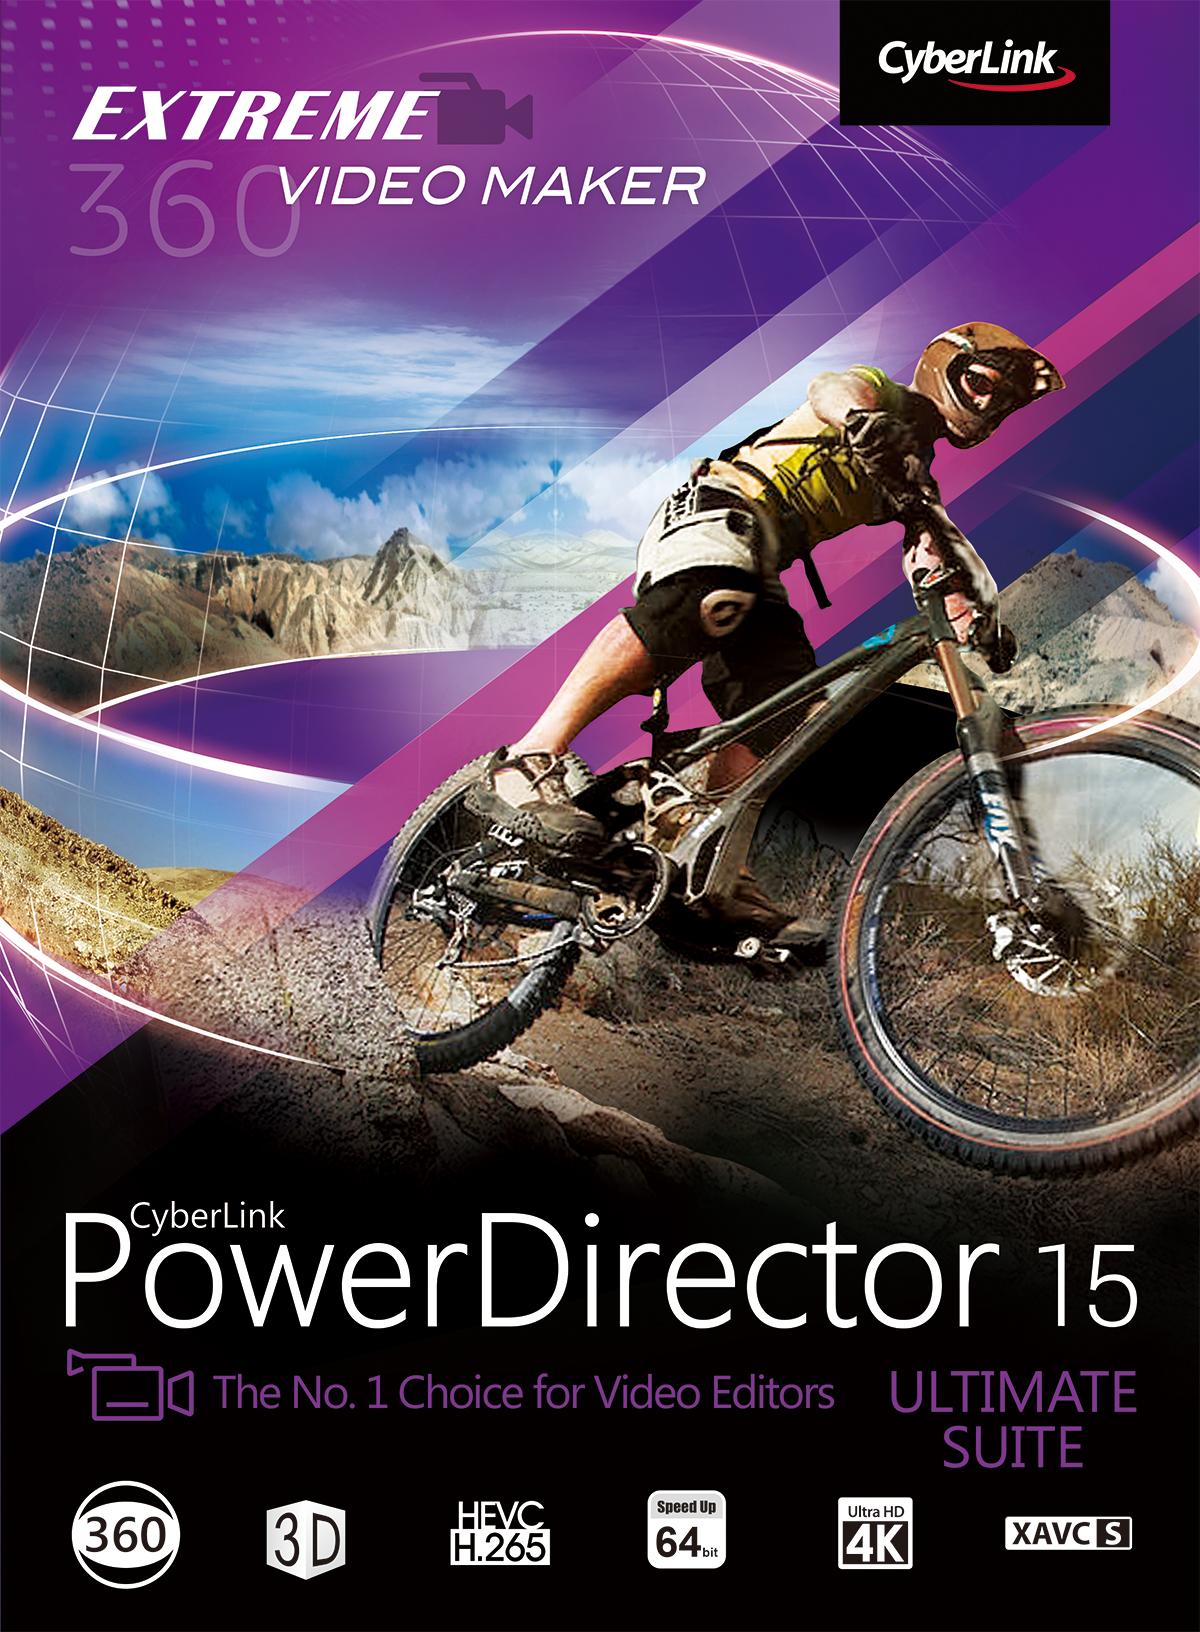 CyberLink PowerDirector 15 Ultimate Suite [Download] by Cyberlink